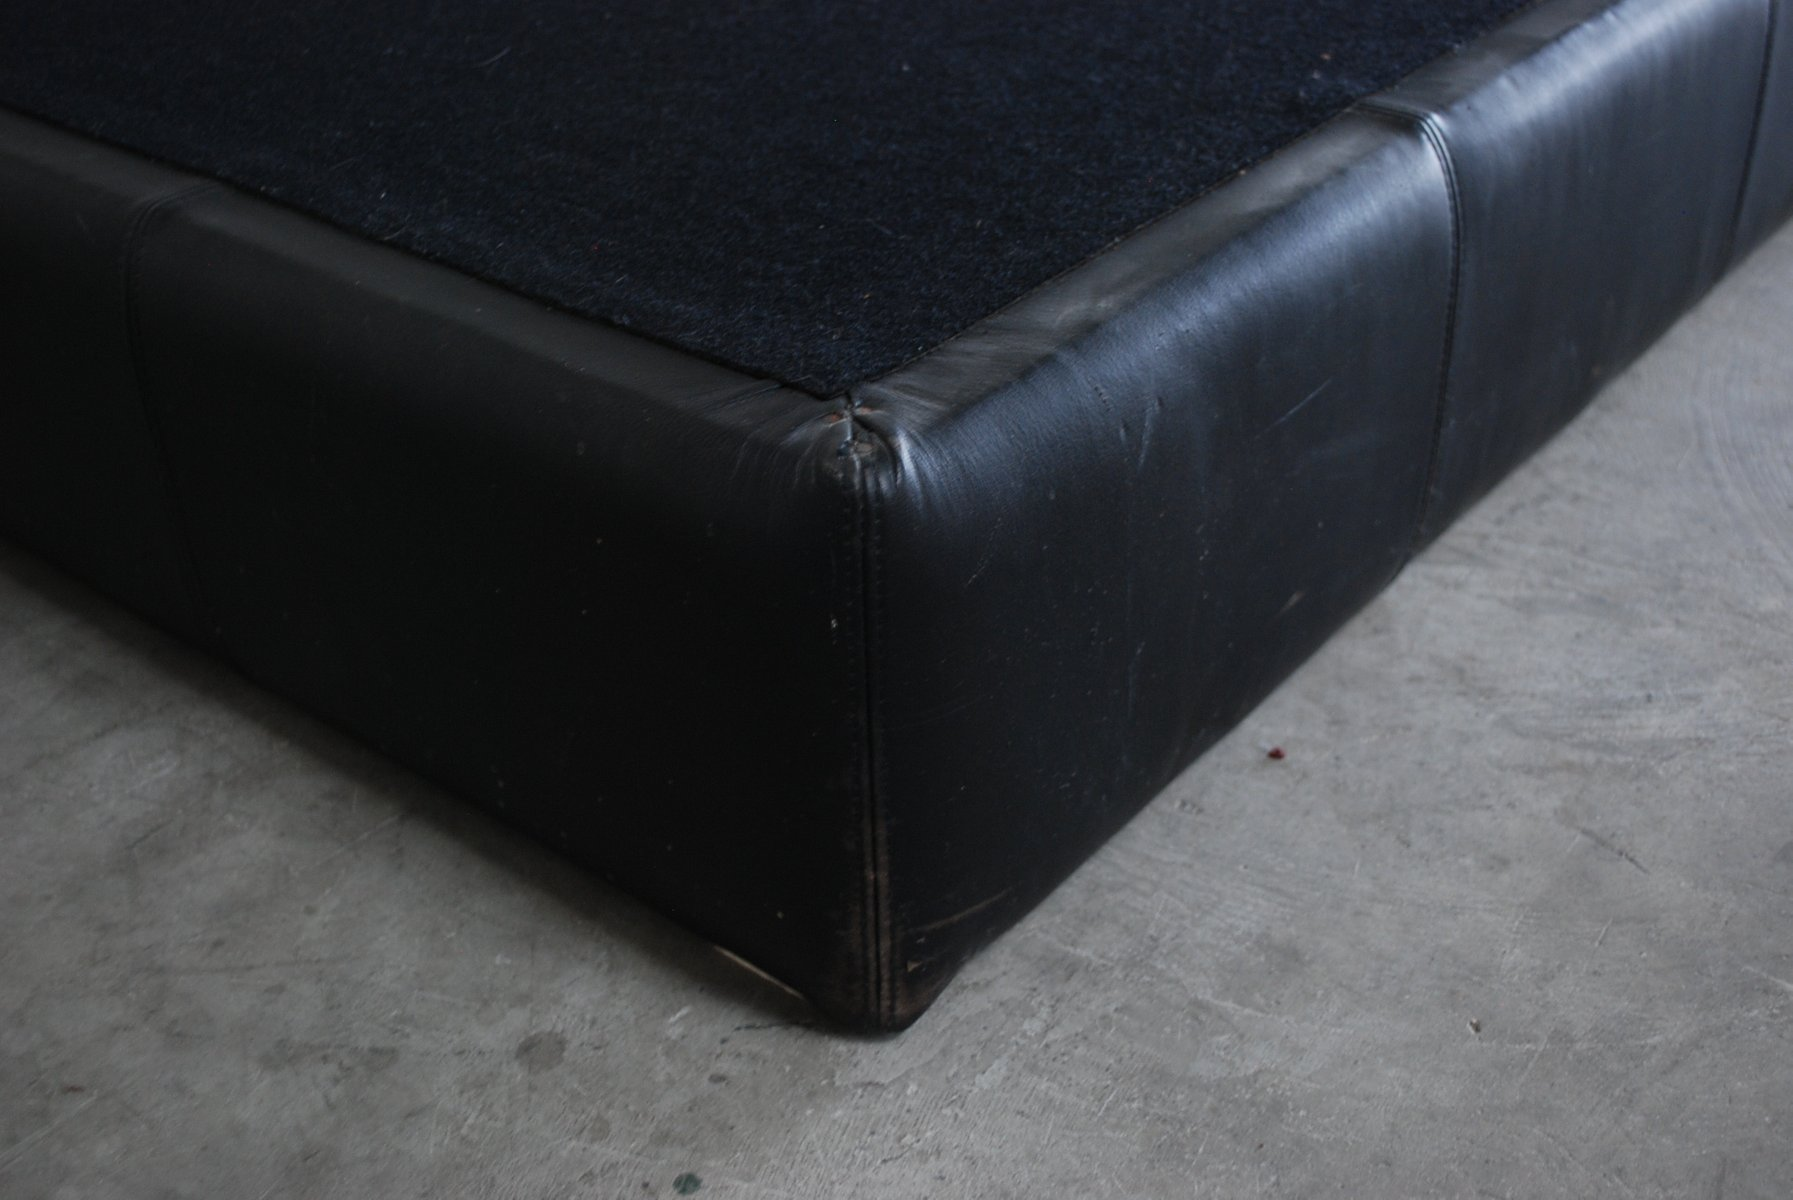 schwarzer vintage ds 88 lederhocker von de sede bei pamono. Black Bedroom Furniture Sets. Home Design Ideas